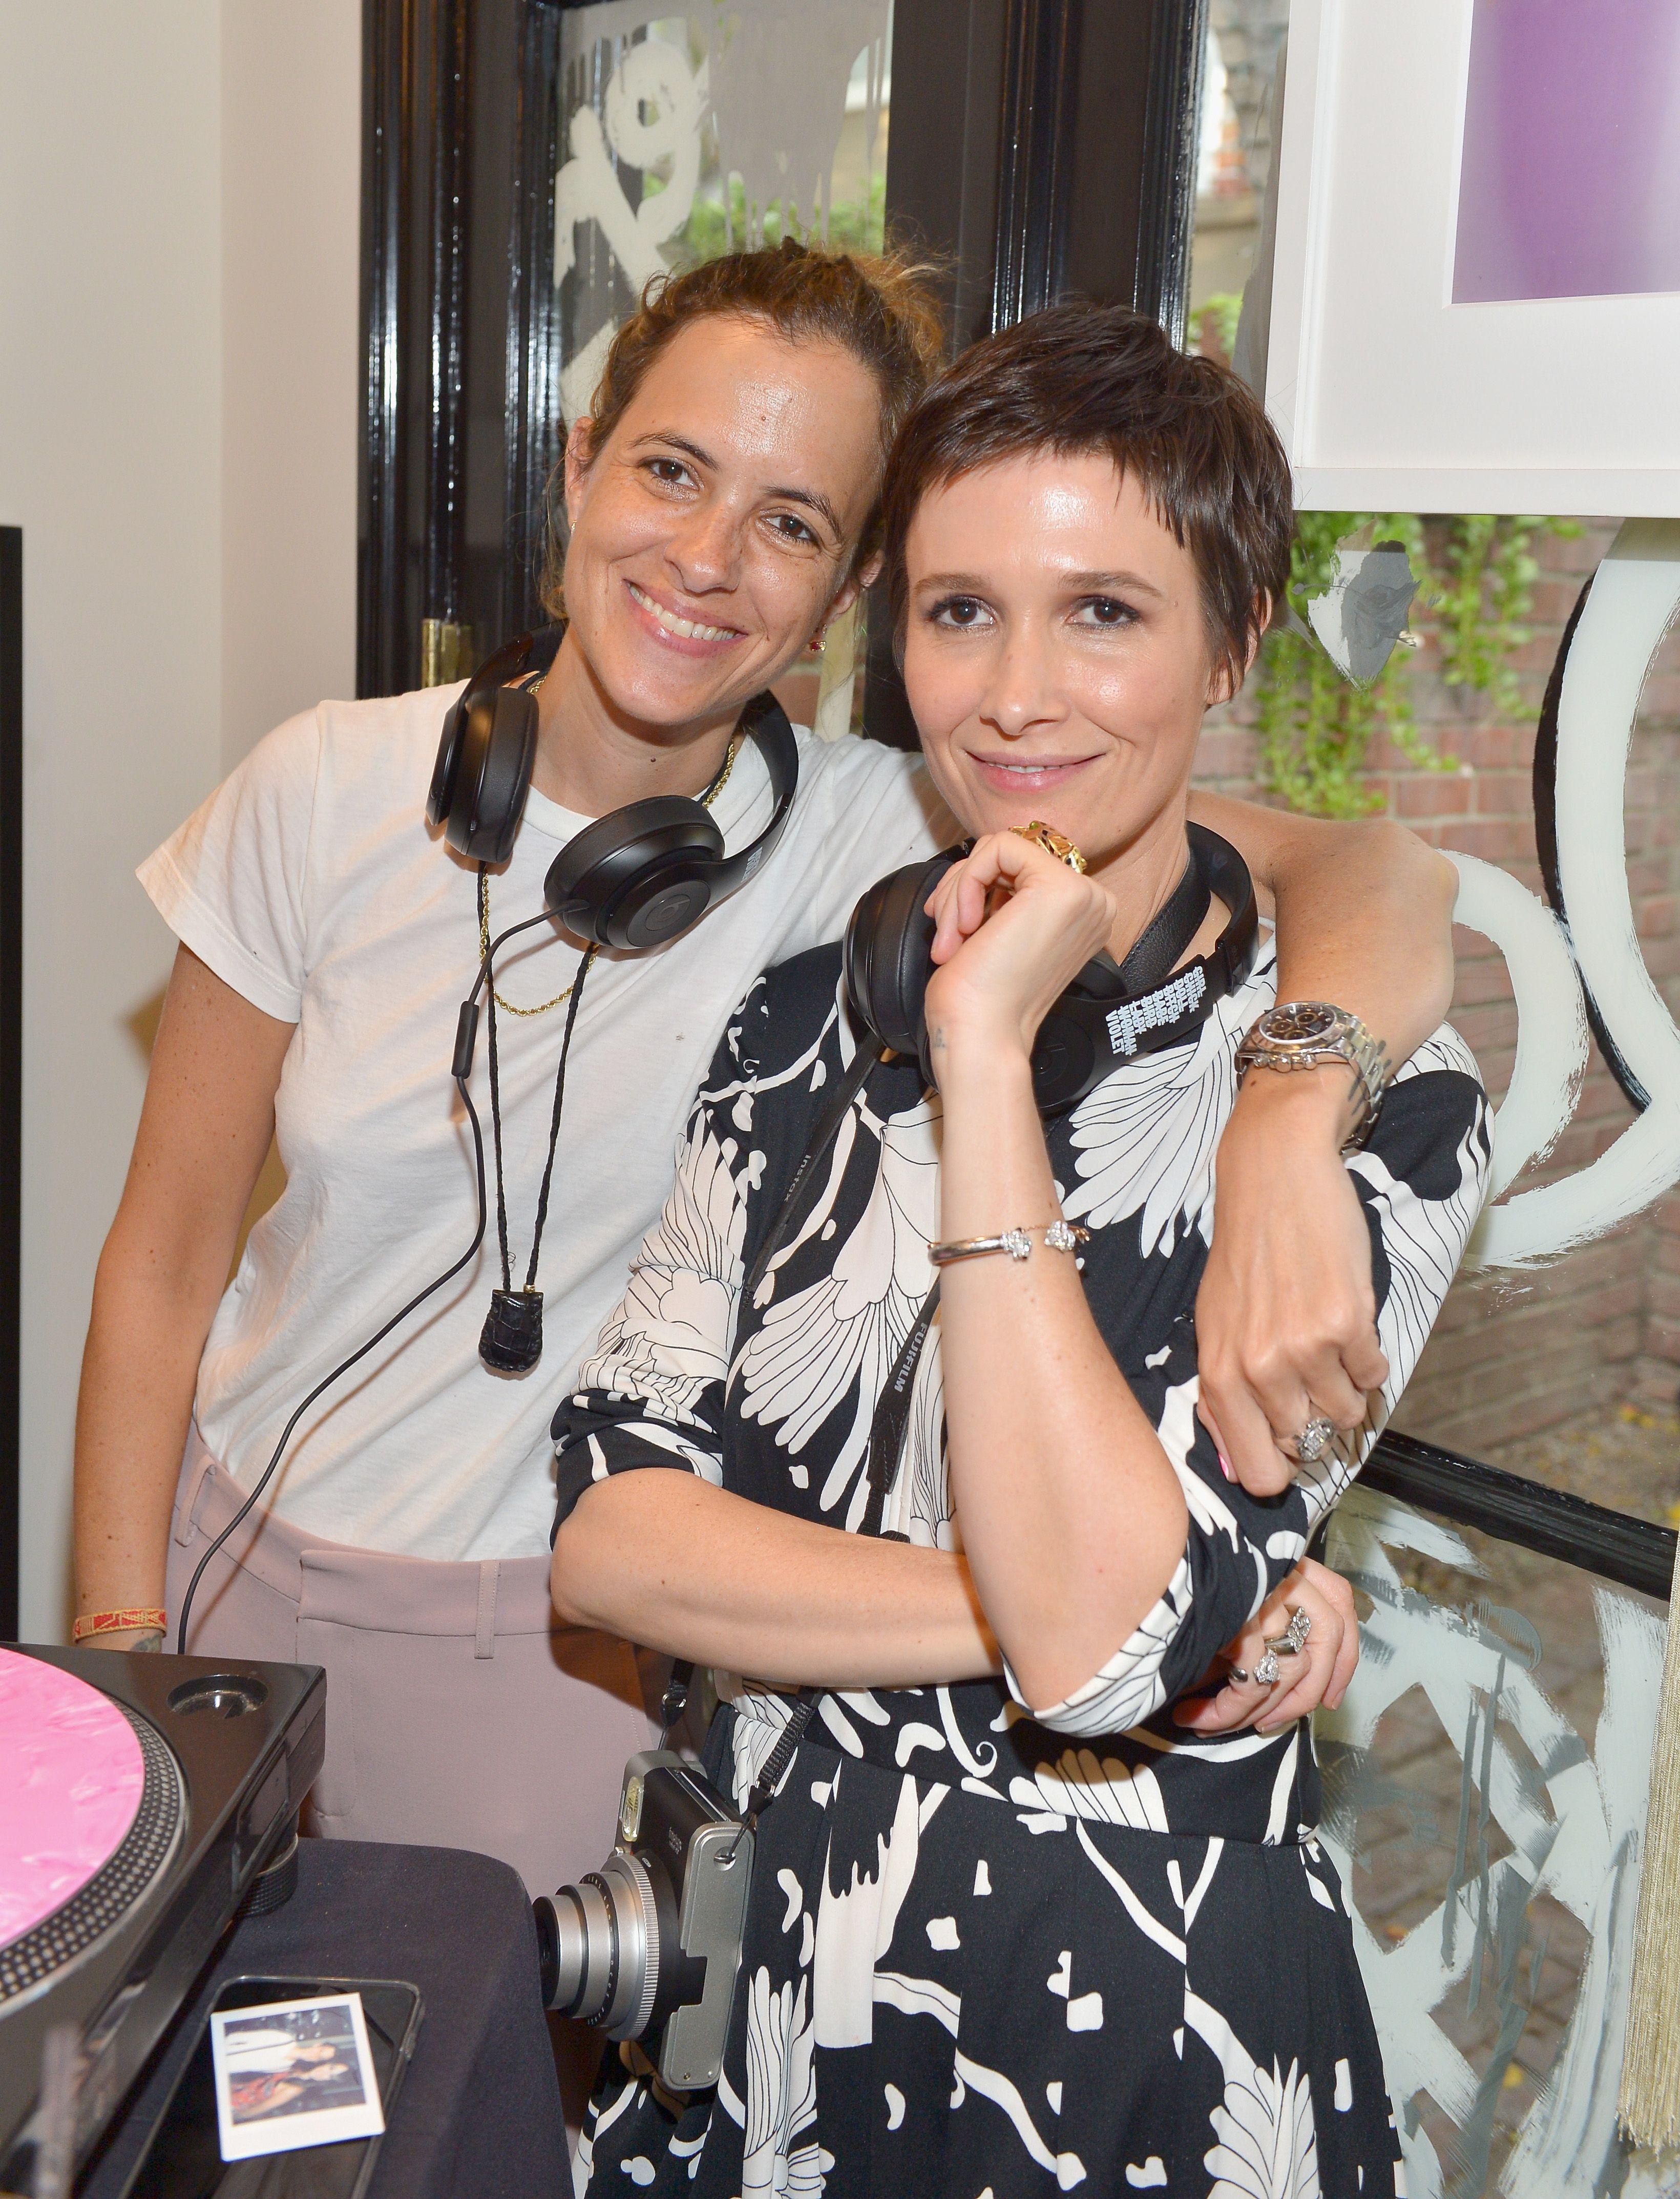 The DJ Samantha Ronson with her new girlfriend Cassandra Grey.